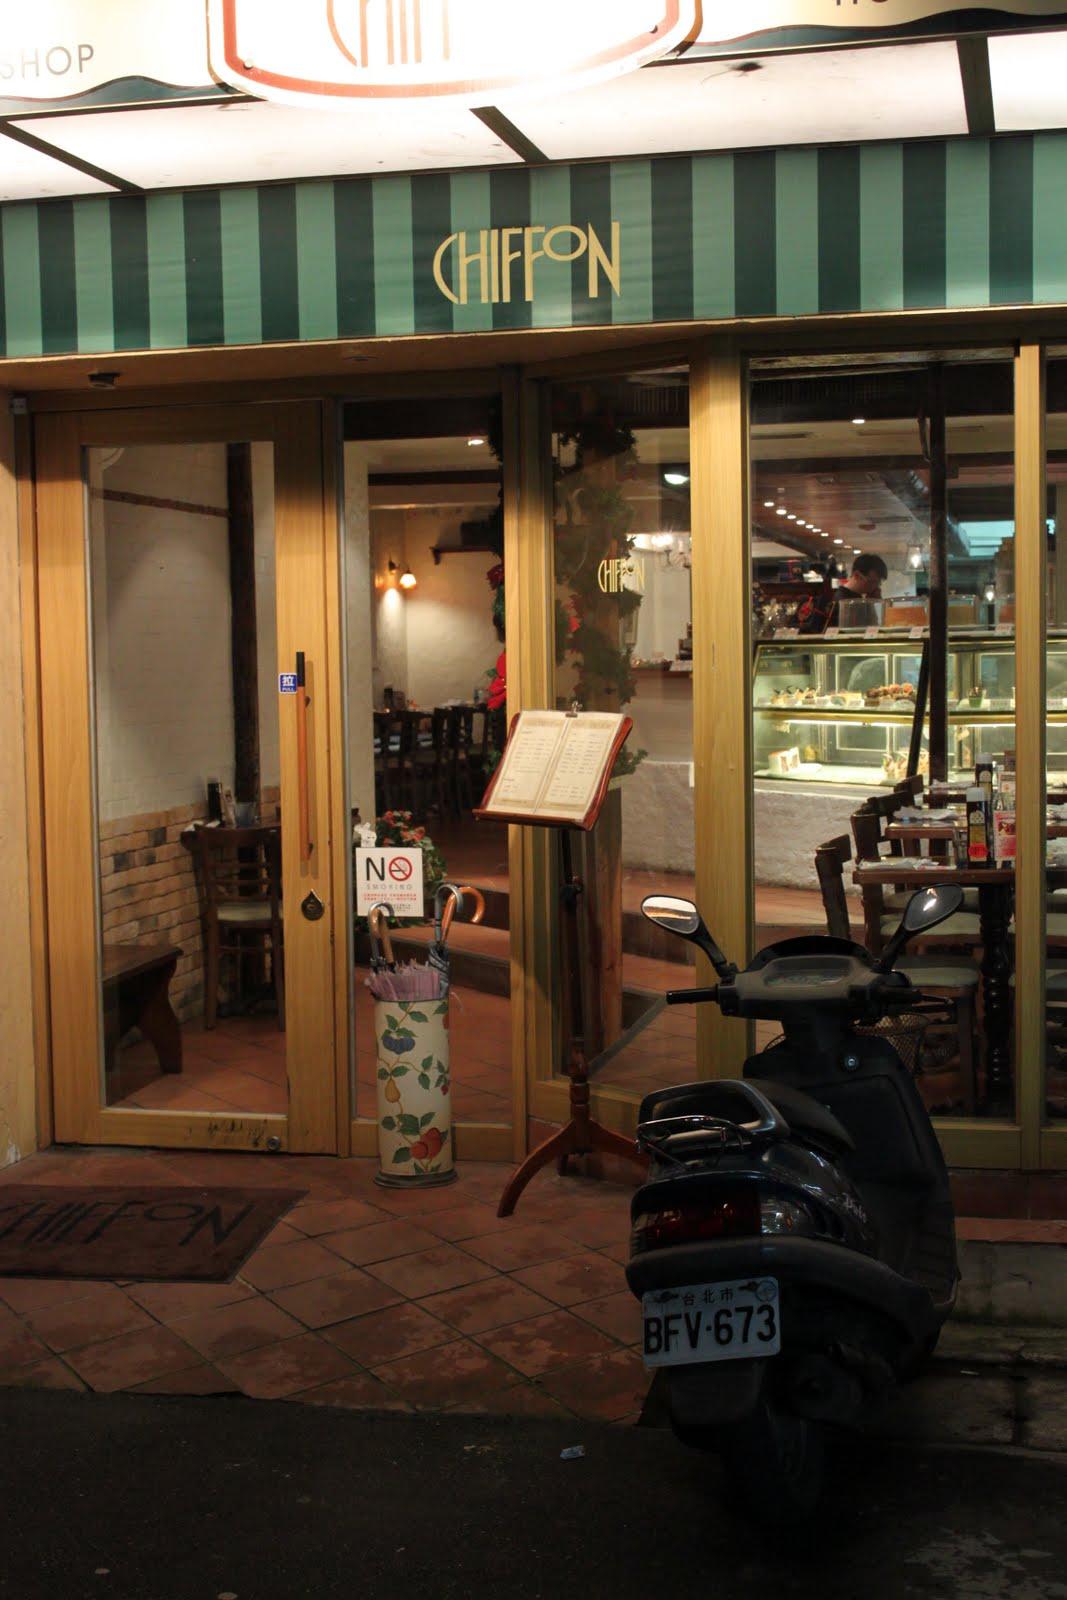 Chiffon 手工蛋糕店。我們的戚風狂熱   seekforfood